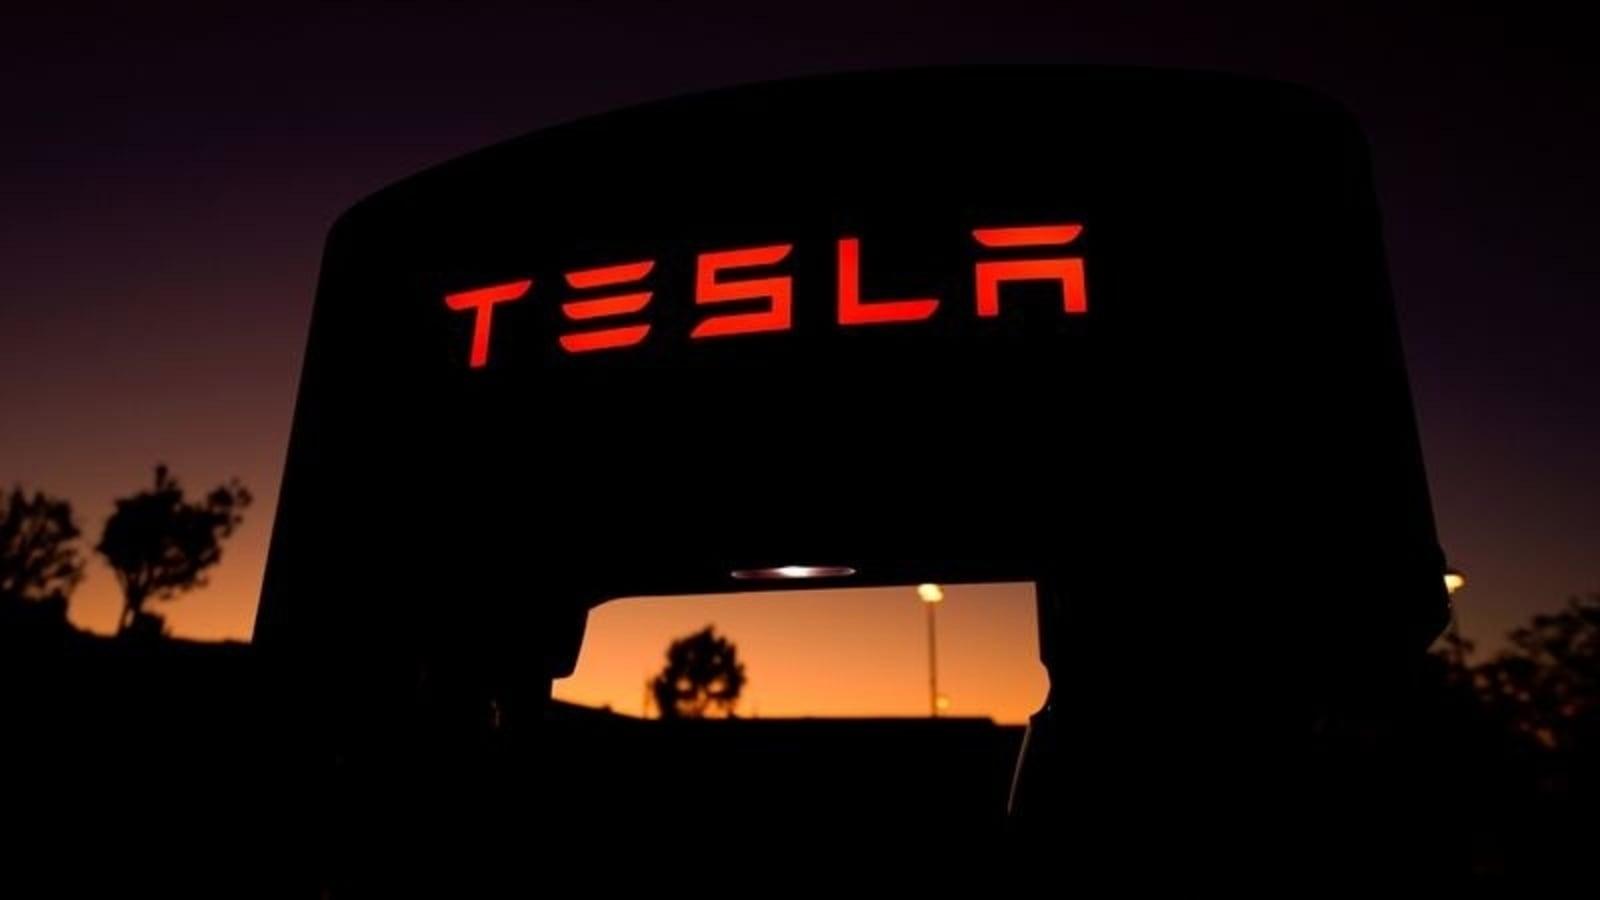 Crash victim used TikTok to praise Tesla's 'full self-driving' capabilities